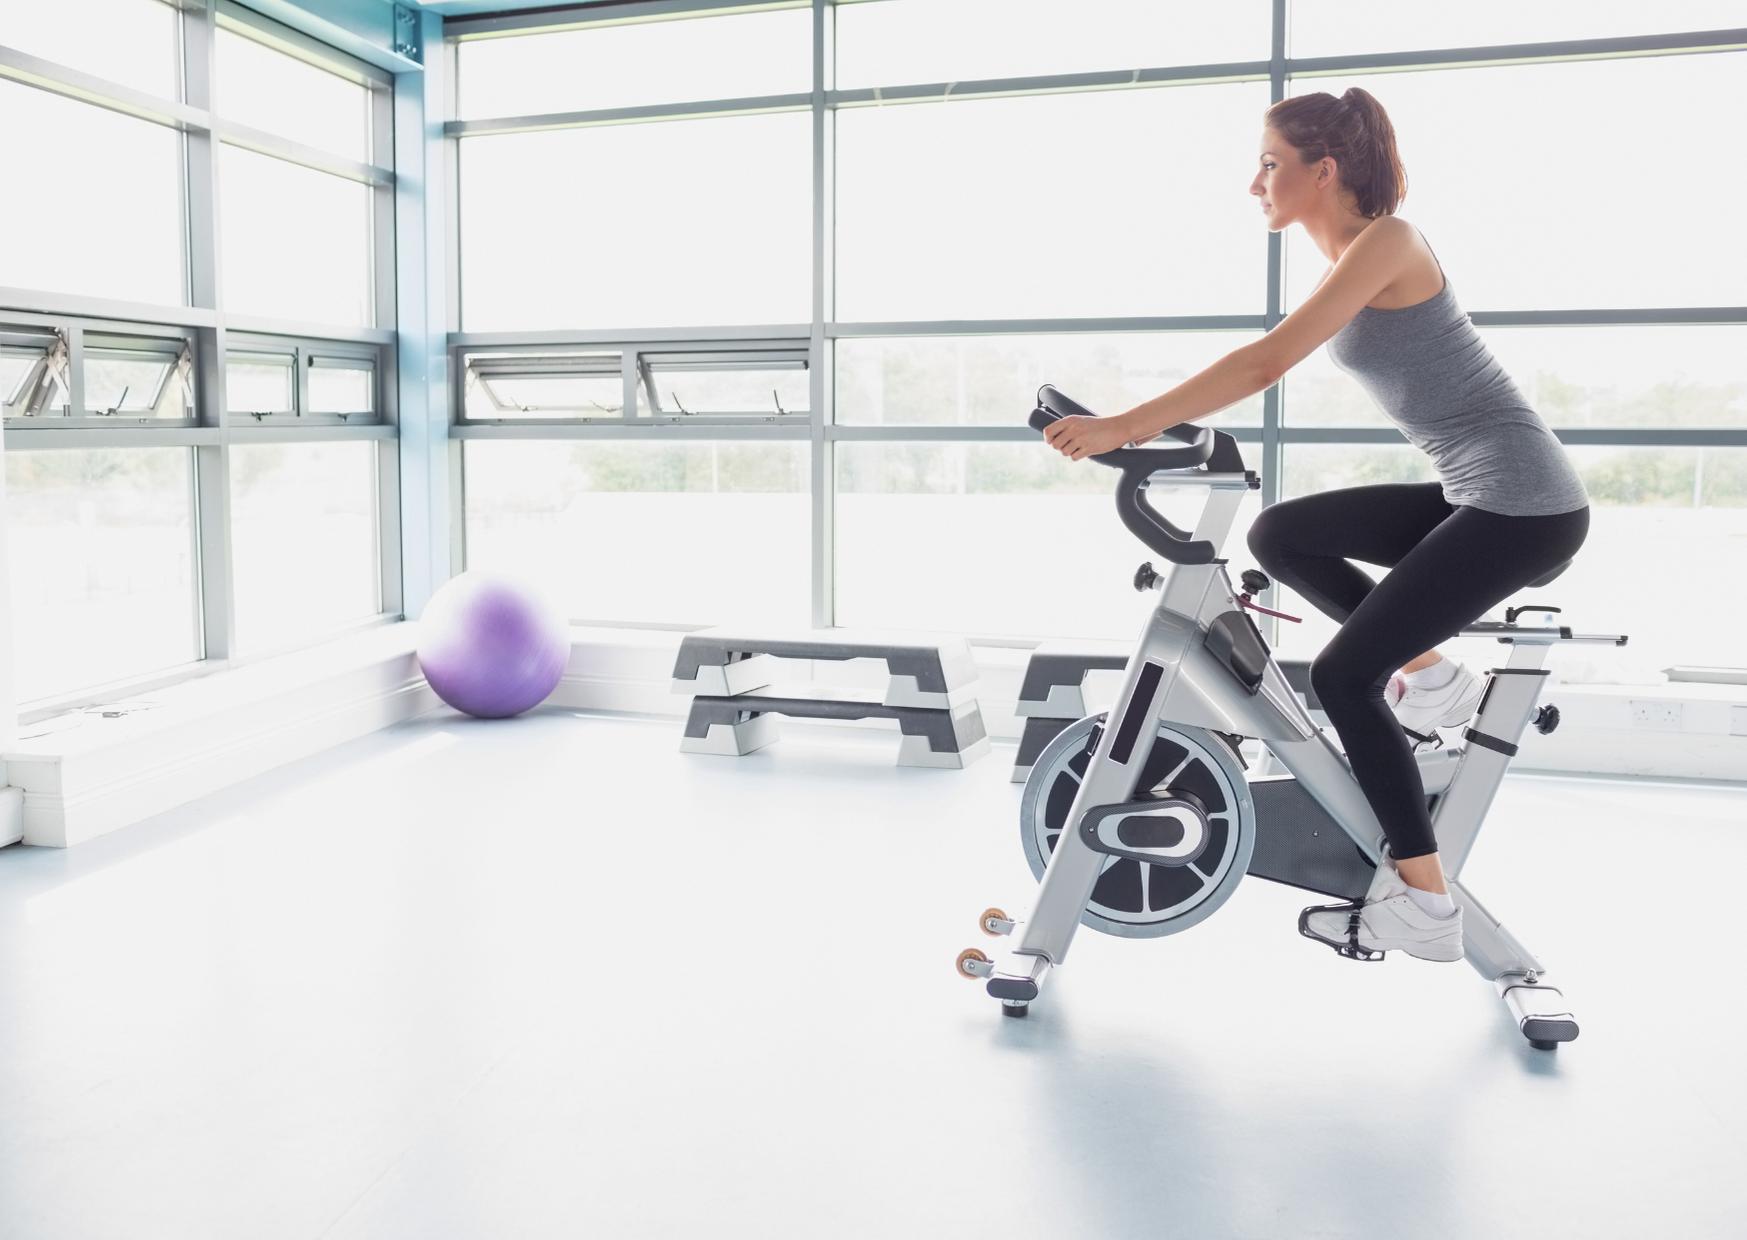 Women Exercise using bike